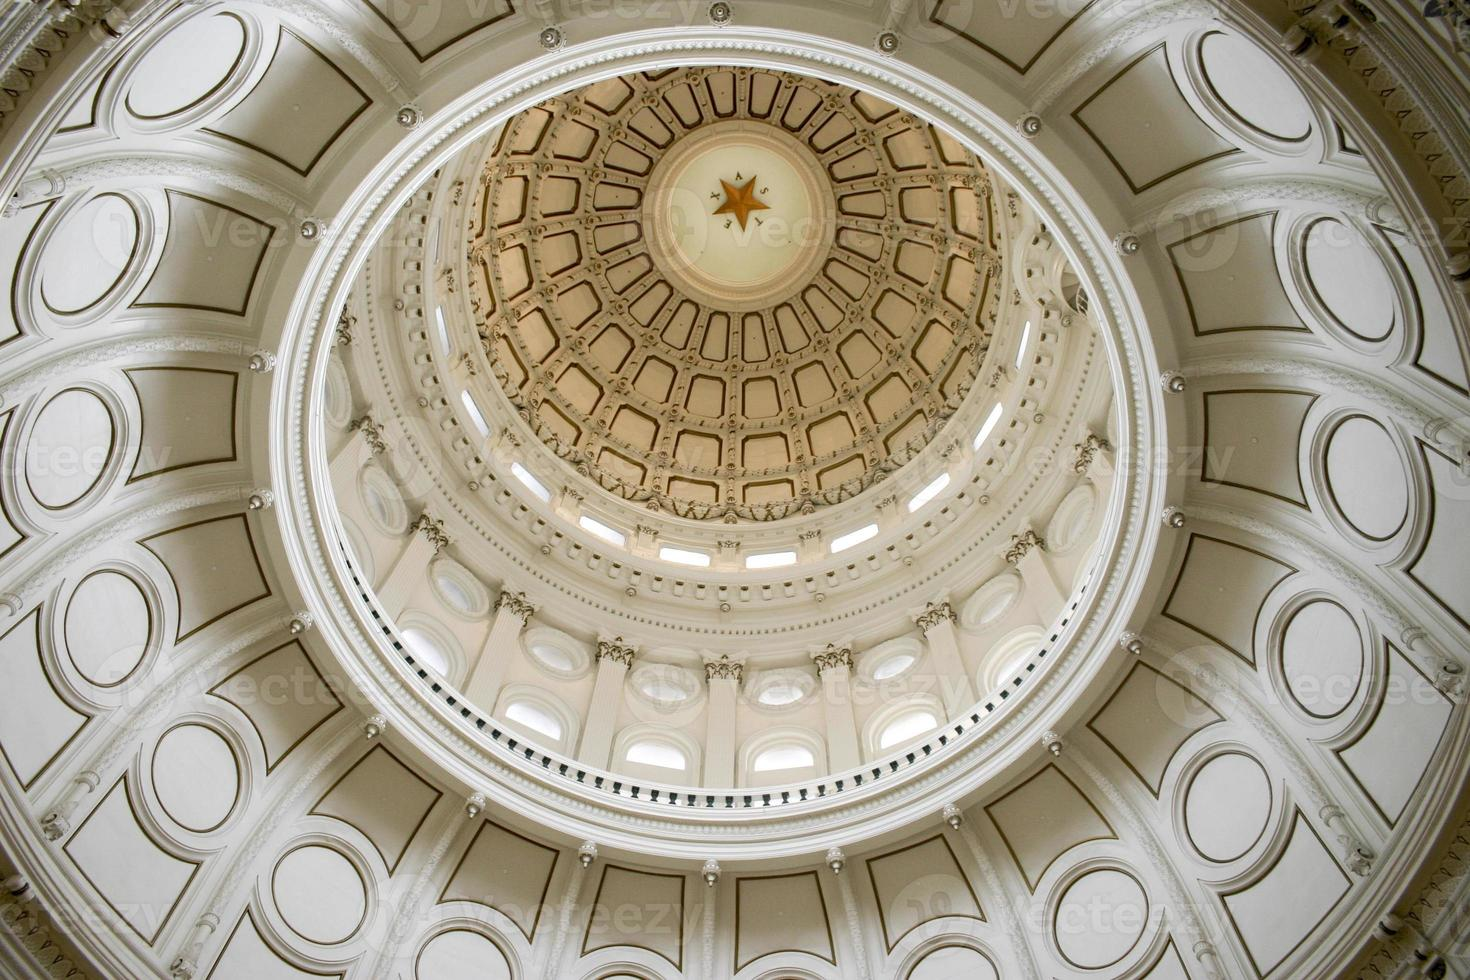 Rotunde des Landeshauptstadtgebäudes in Austin, Texas foto